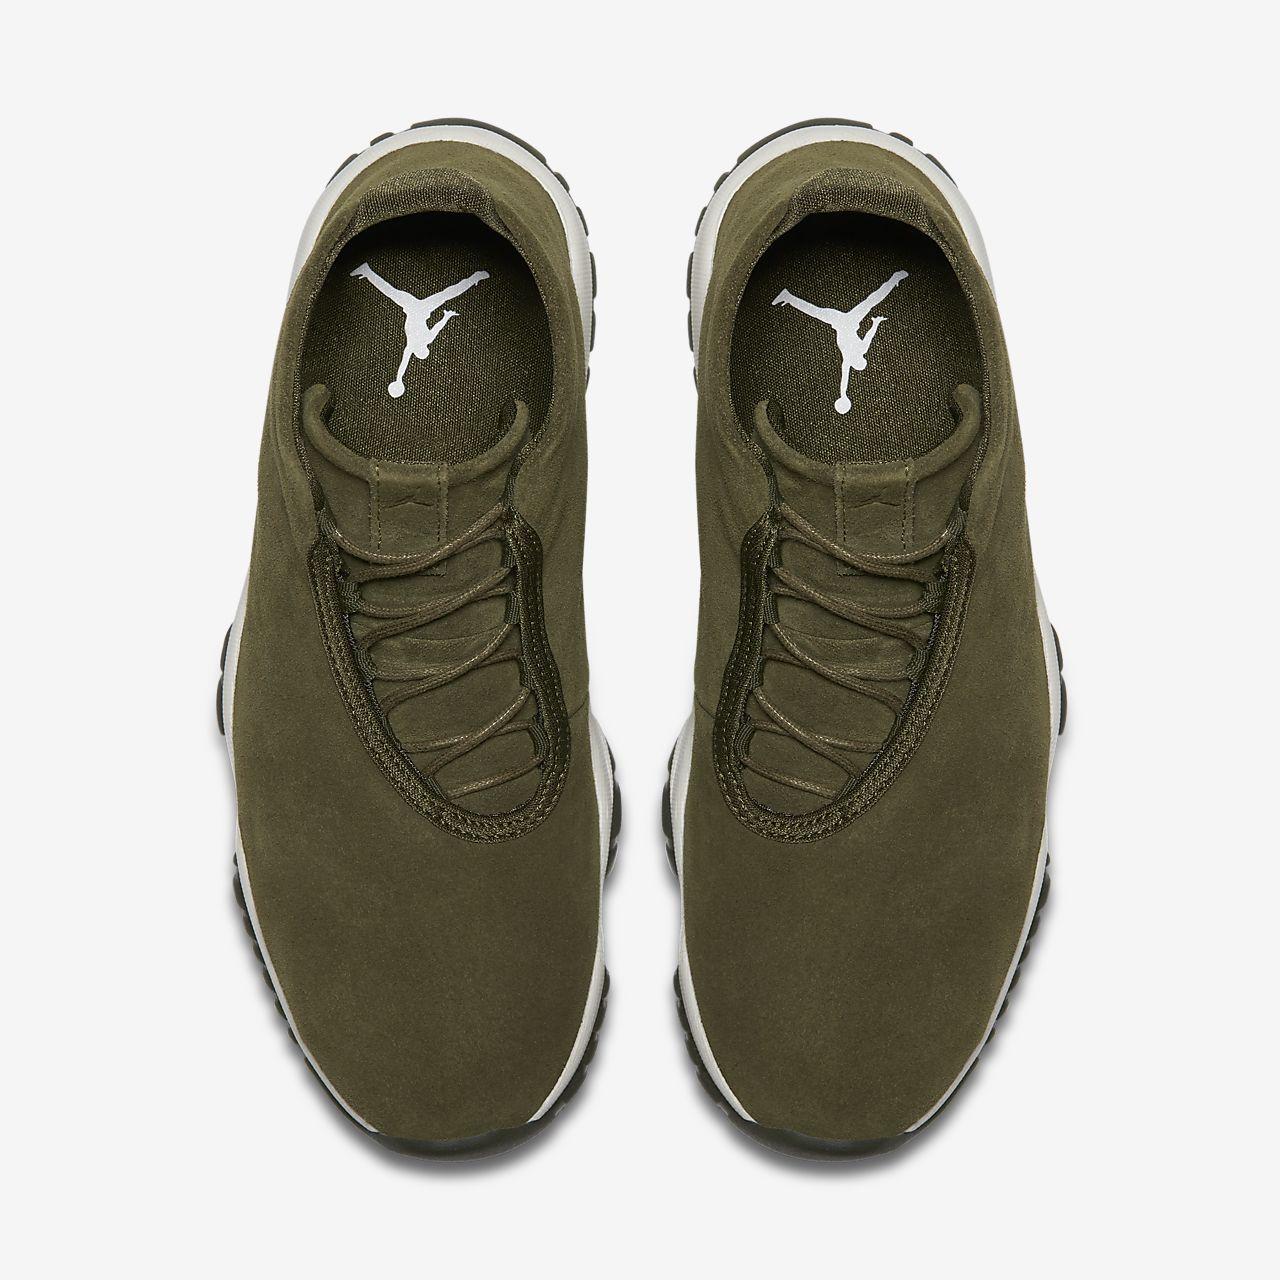 18c506a0b9a Air Jordan Future Women s Shoe. Nike.com GB